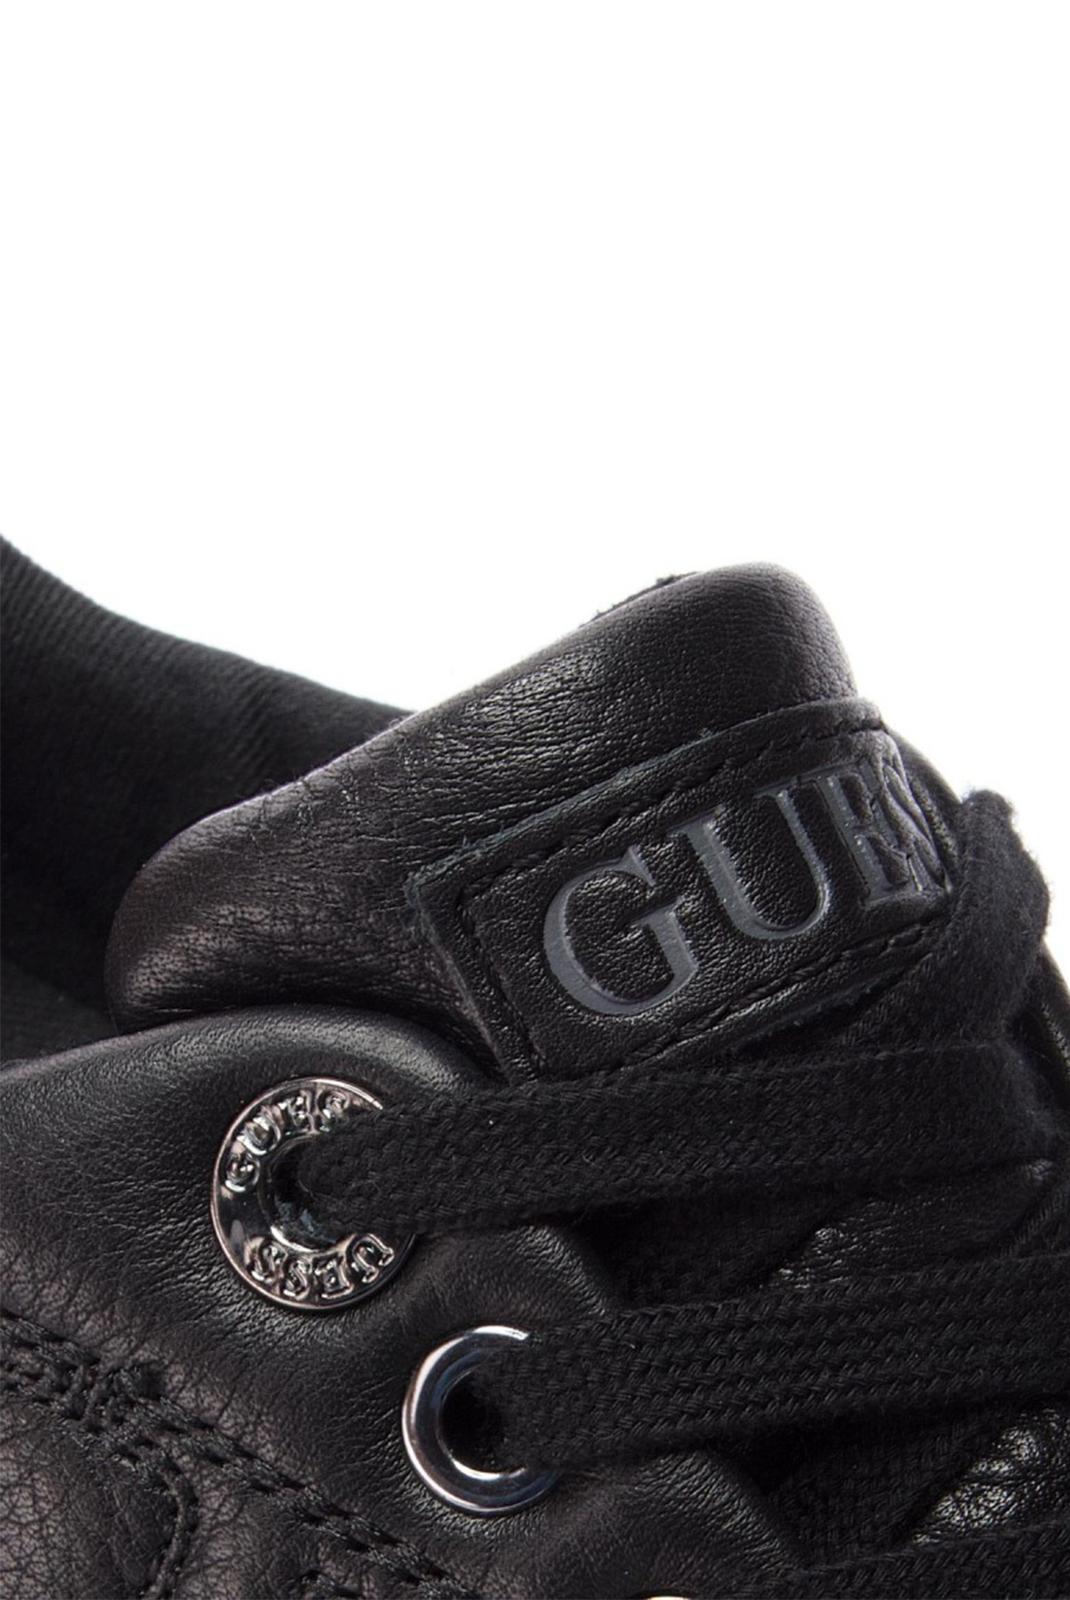 Baskets / Sneakers  Guess jeans FLCE34 LEA12 BLACK